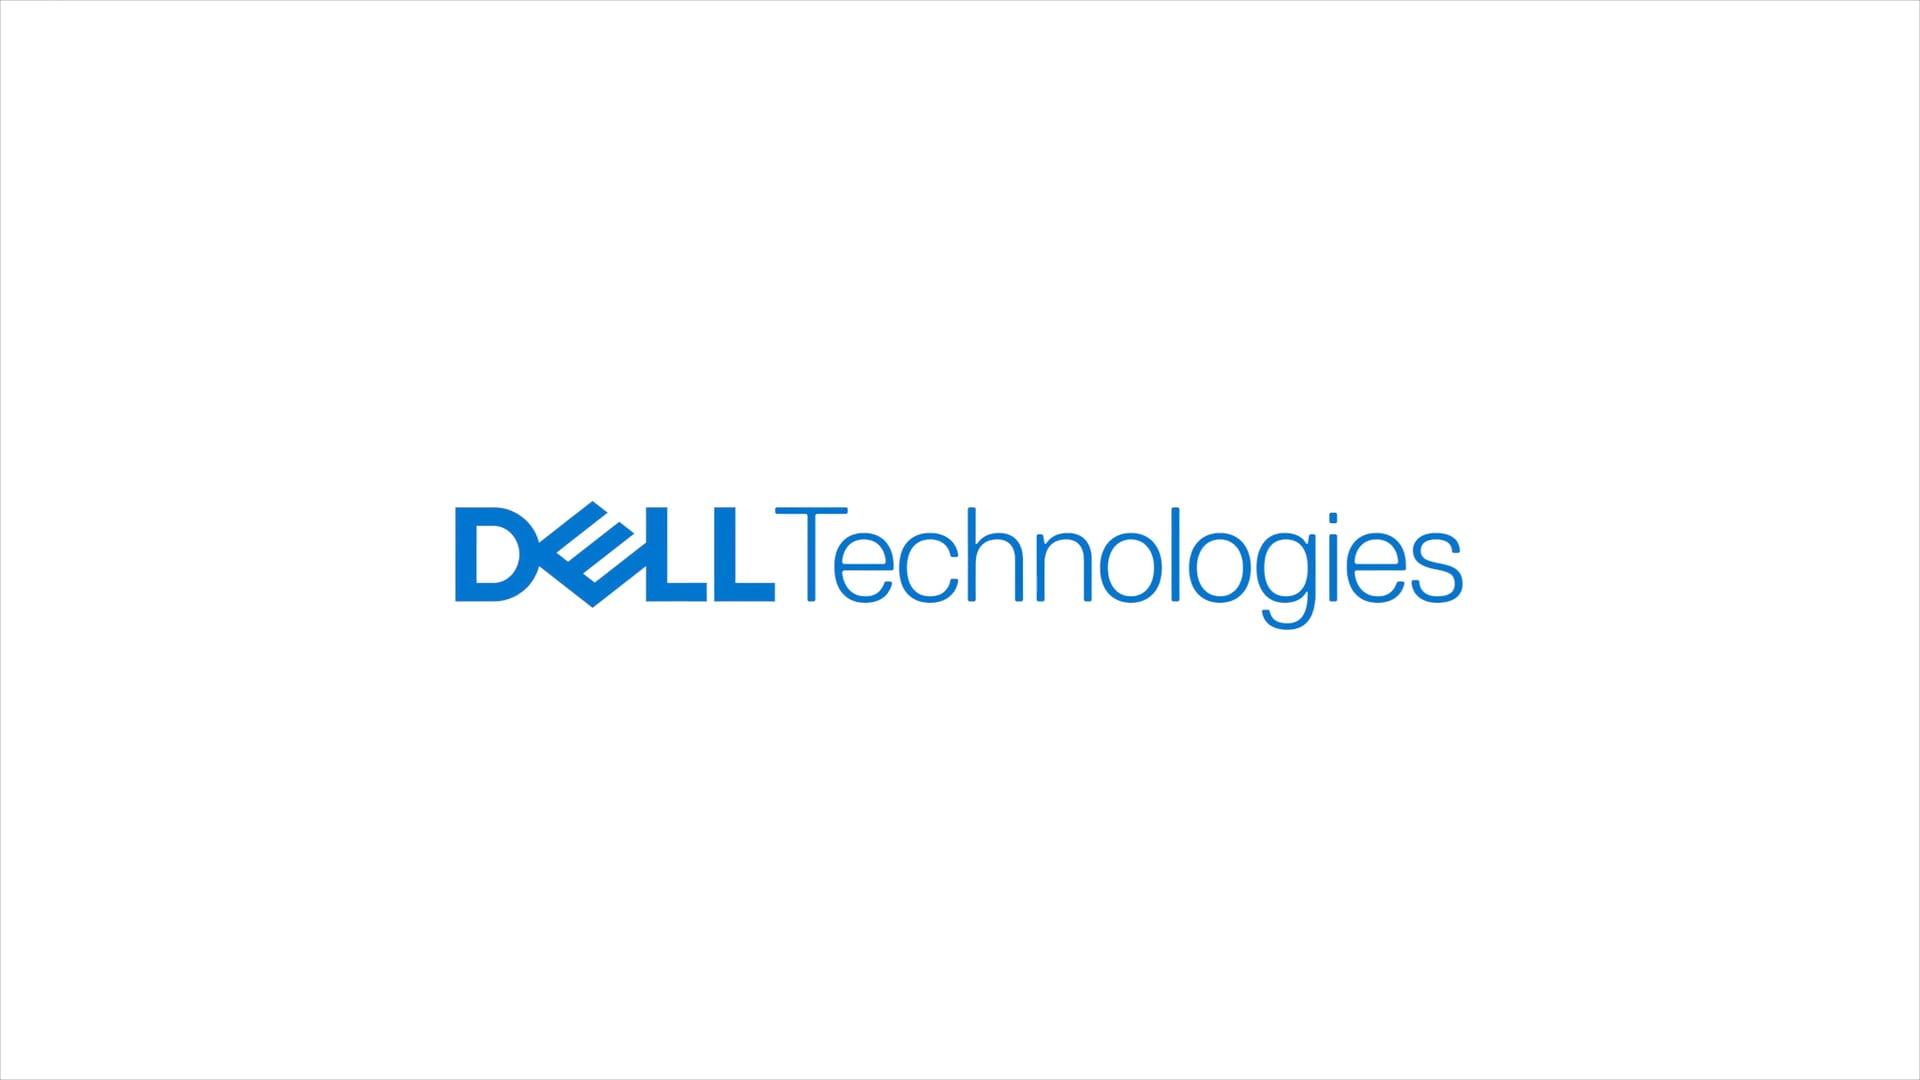 Dell x Windcloud